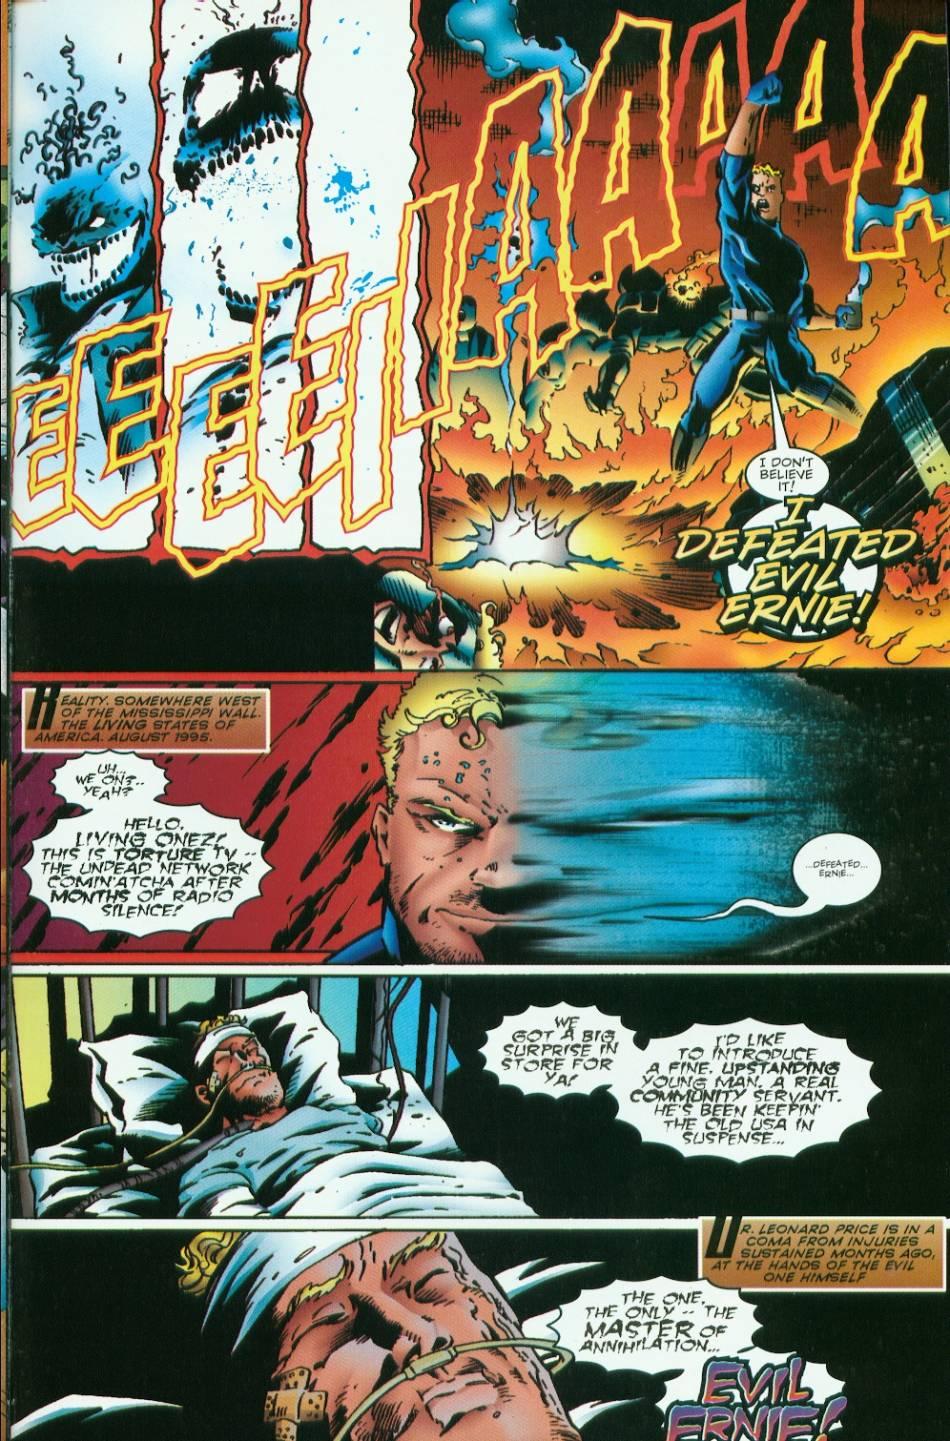 Read online Evil Ernie vs. the Superheroes comic -  Issue #1 - 29